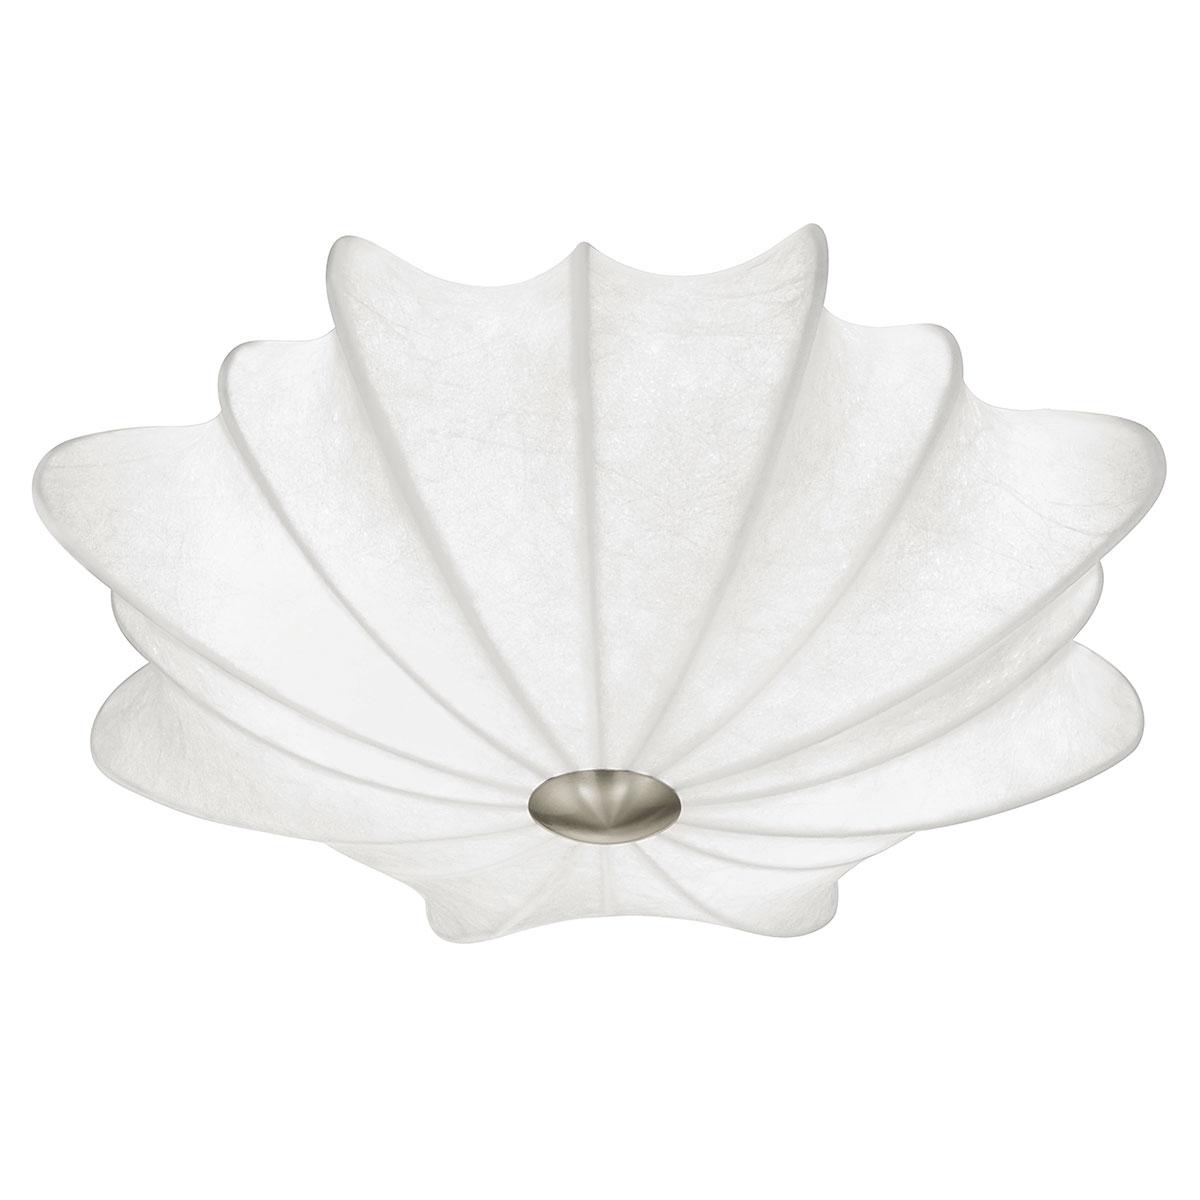 Image of   Eglo loftlampe - Cocoon - Calandra - Hvid